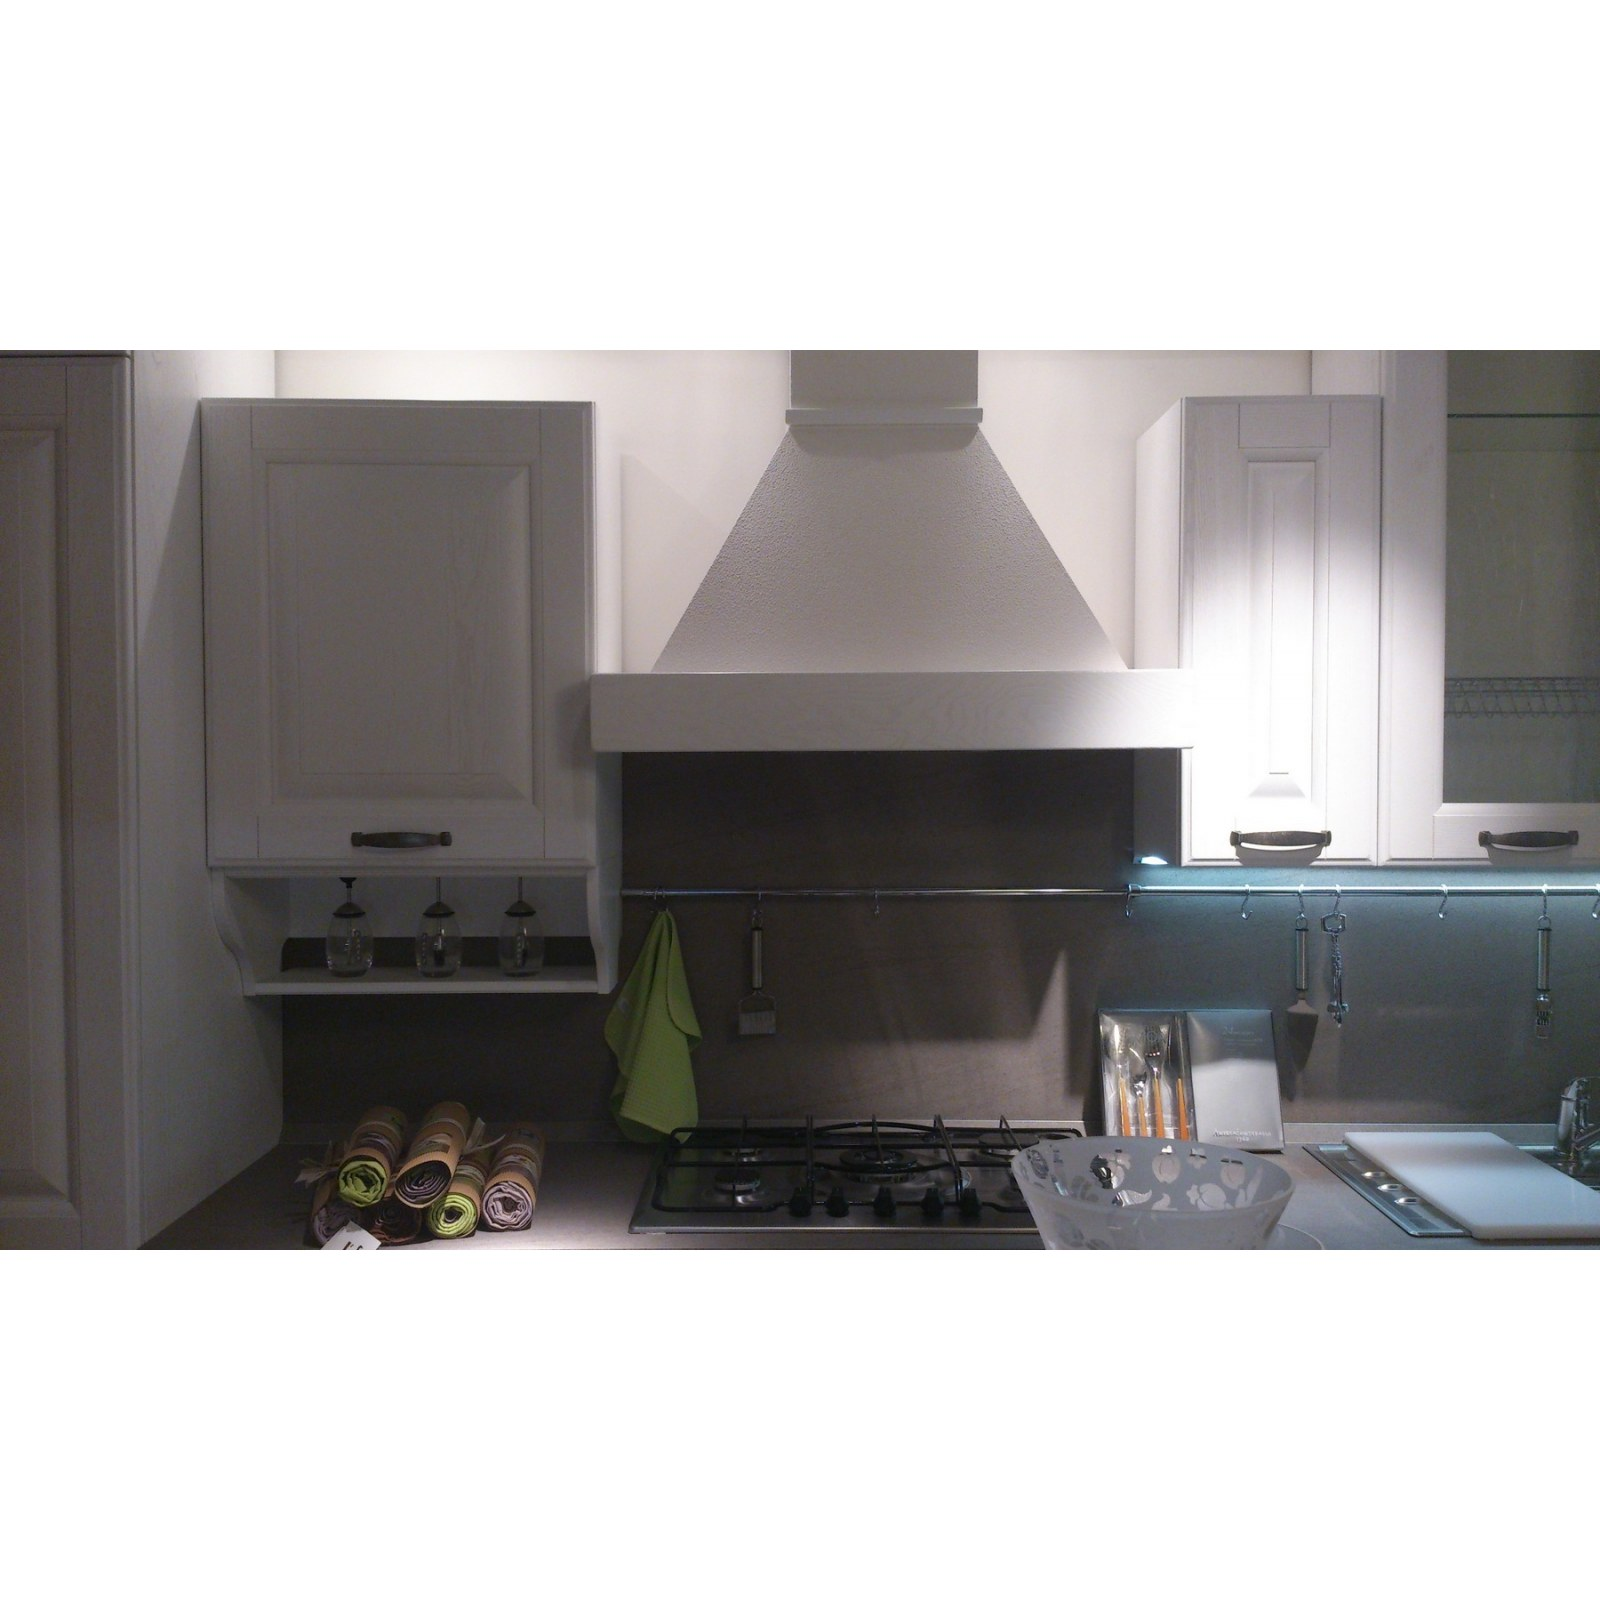 Cucina paola decap la casa moderna mariotti casa for La cucina moderna wikipedia